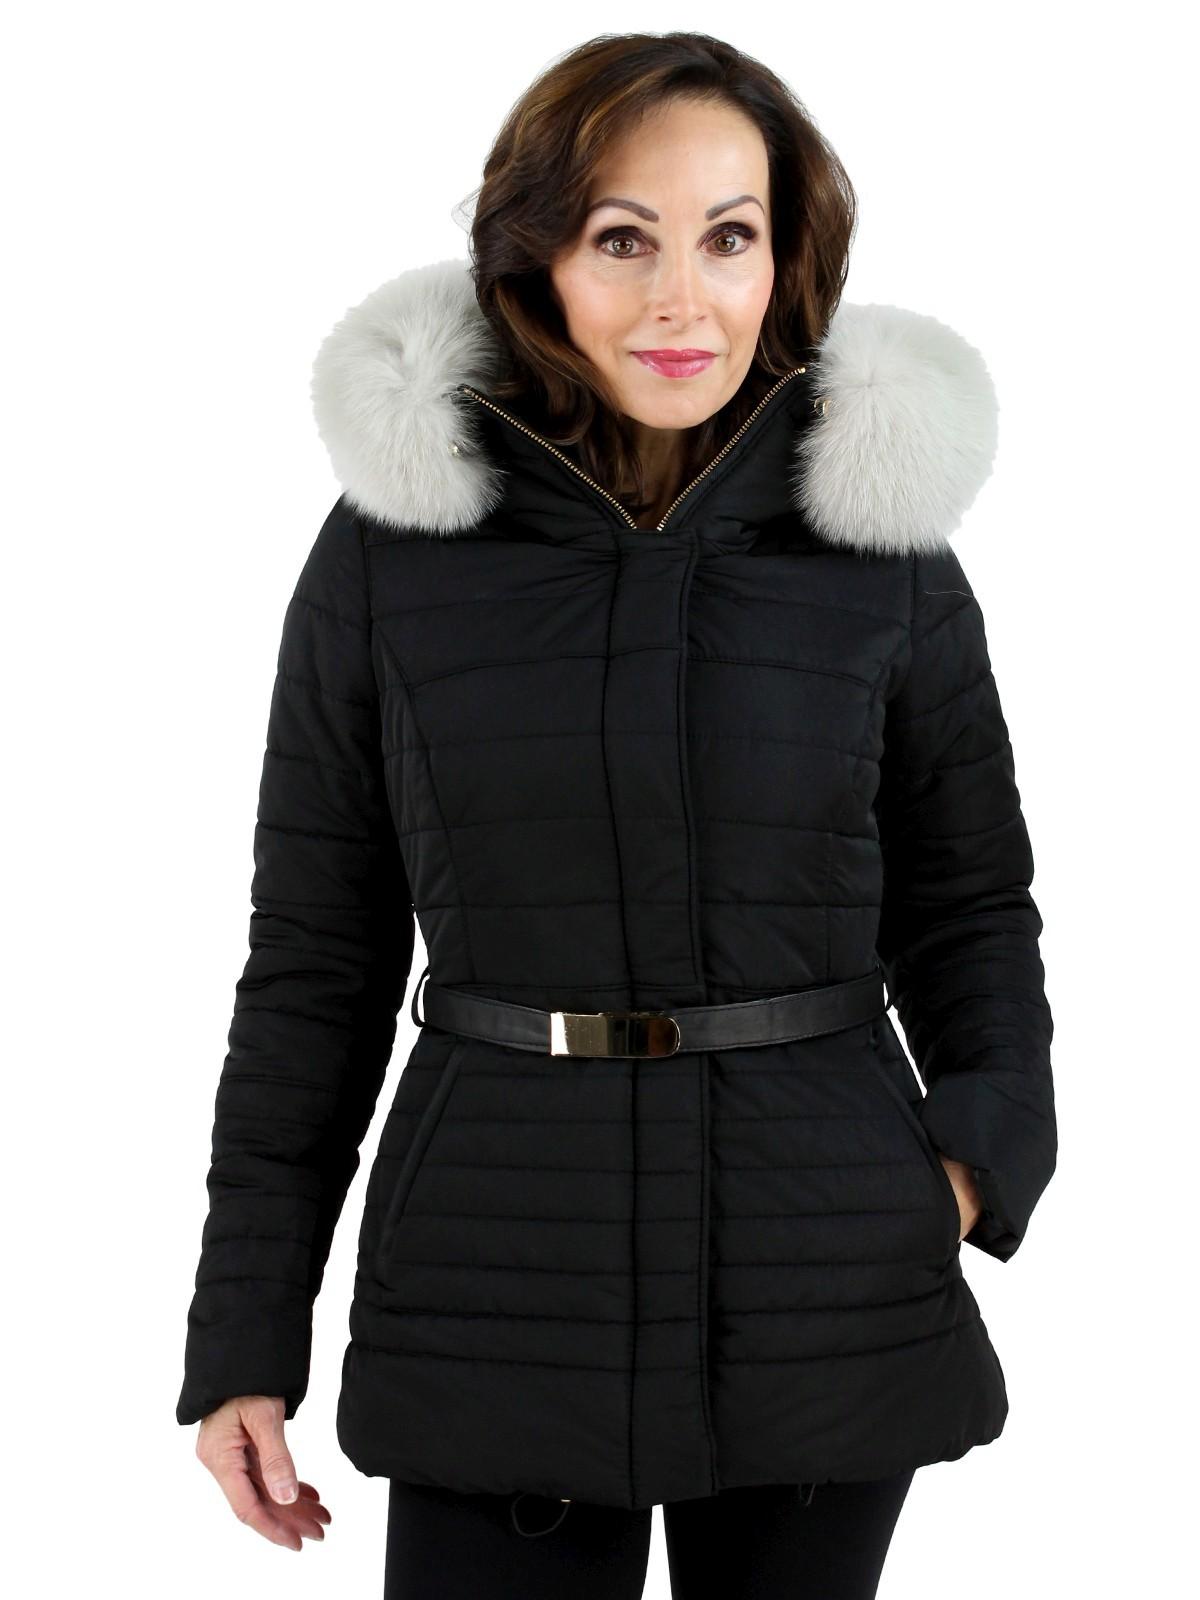 Gorski Black Woman's Apres-Ski Fabric Jacket with White Fox Trimmed Hood